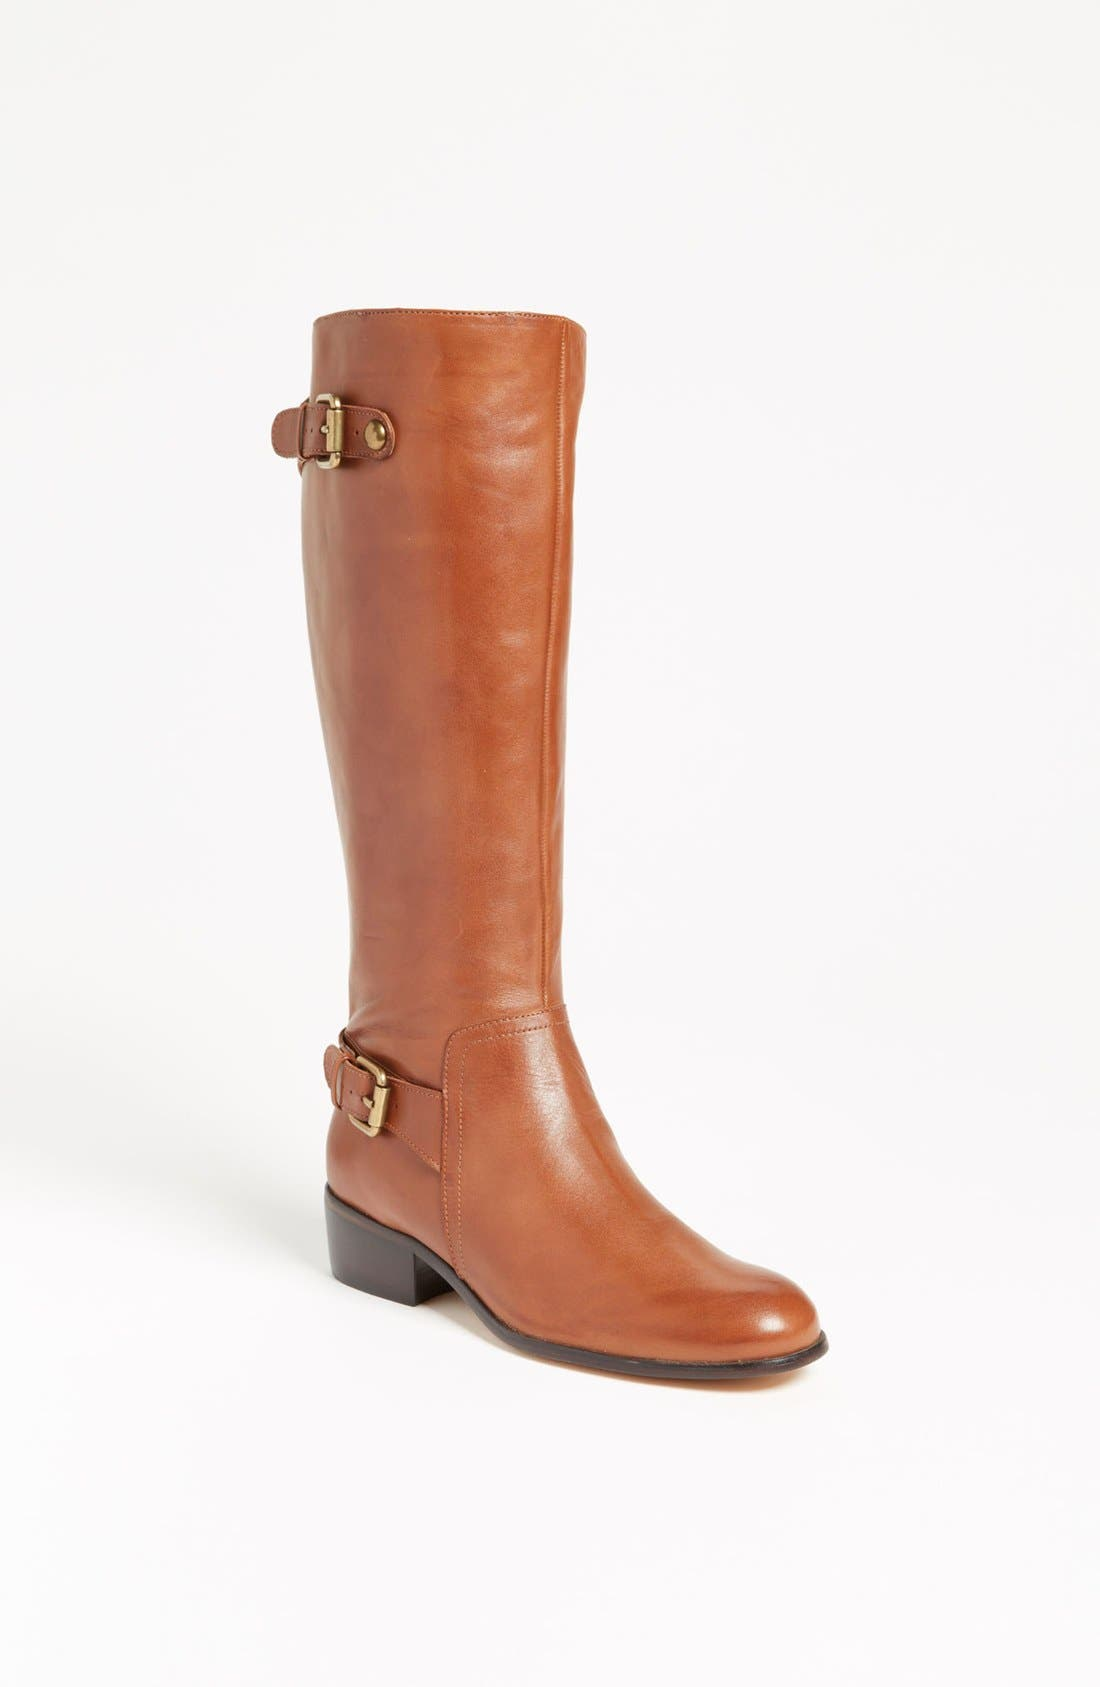 Alternate Image 1 Selected - Corso Como 'Francine' Boot (Wide Calf)(Nordstrom Exclusive)